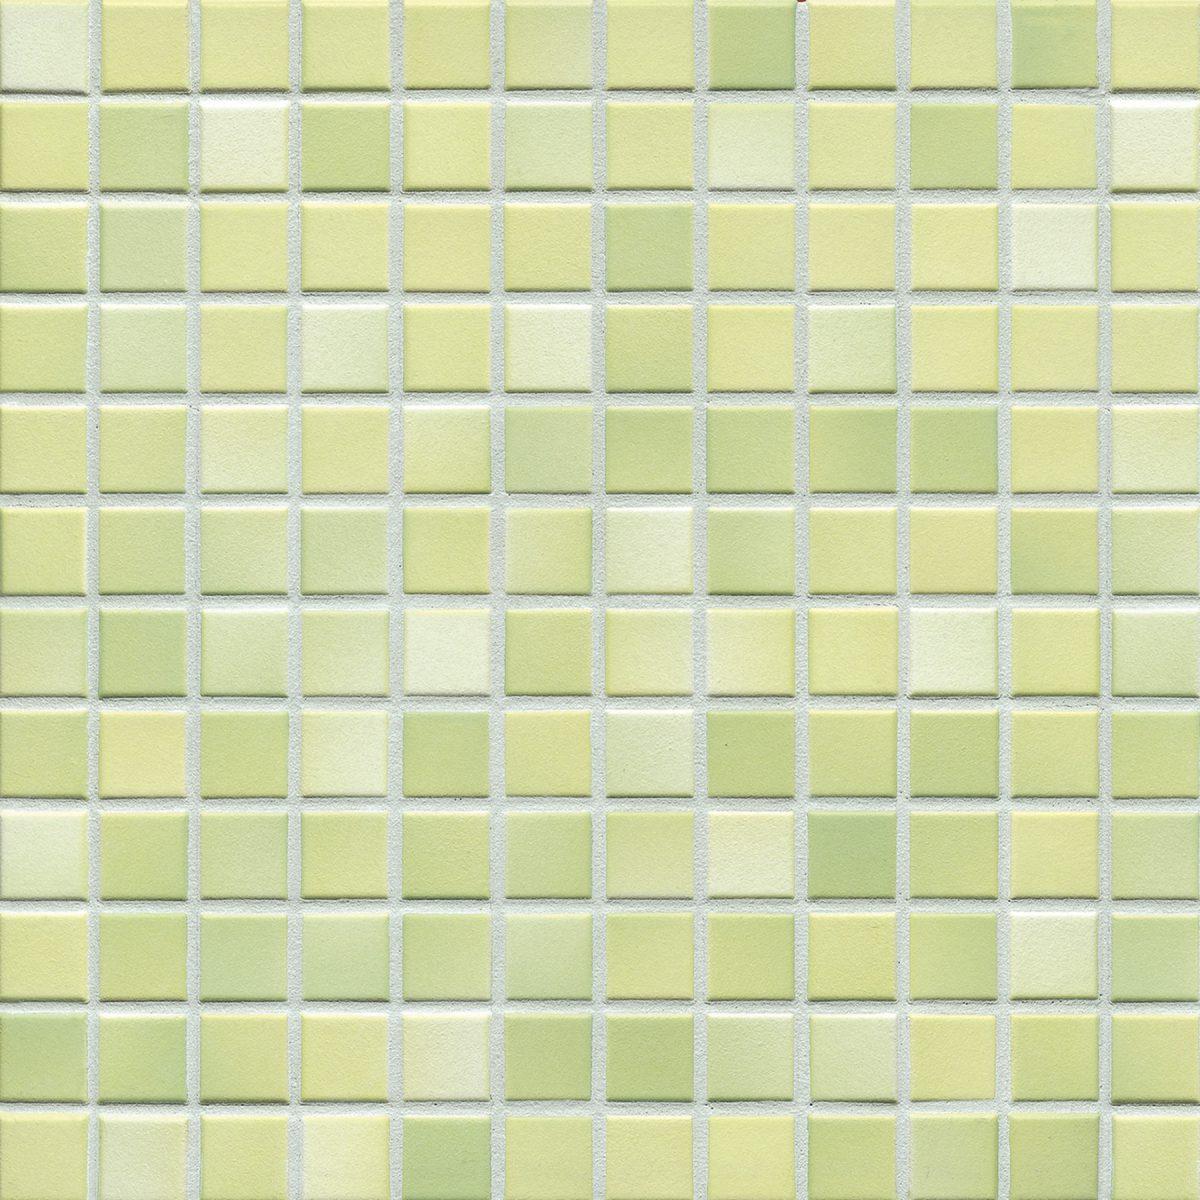 Мозаика серия Fresh 2,4 X 2,4 см Lime Green Mix Secura (противоскользящая R10/B)